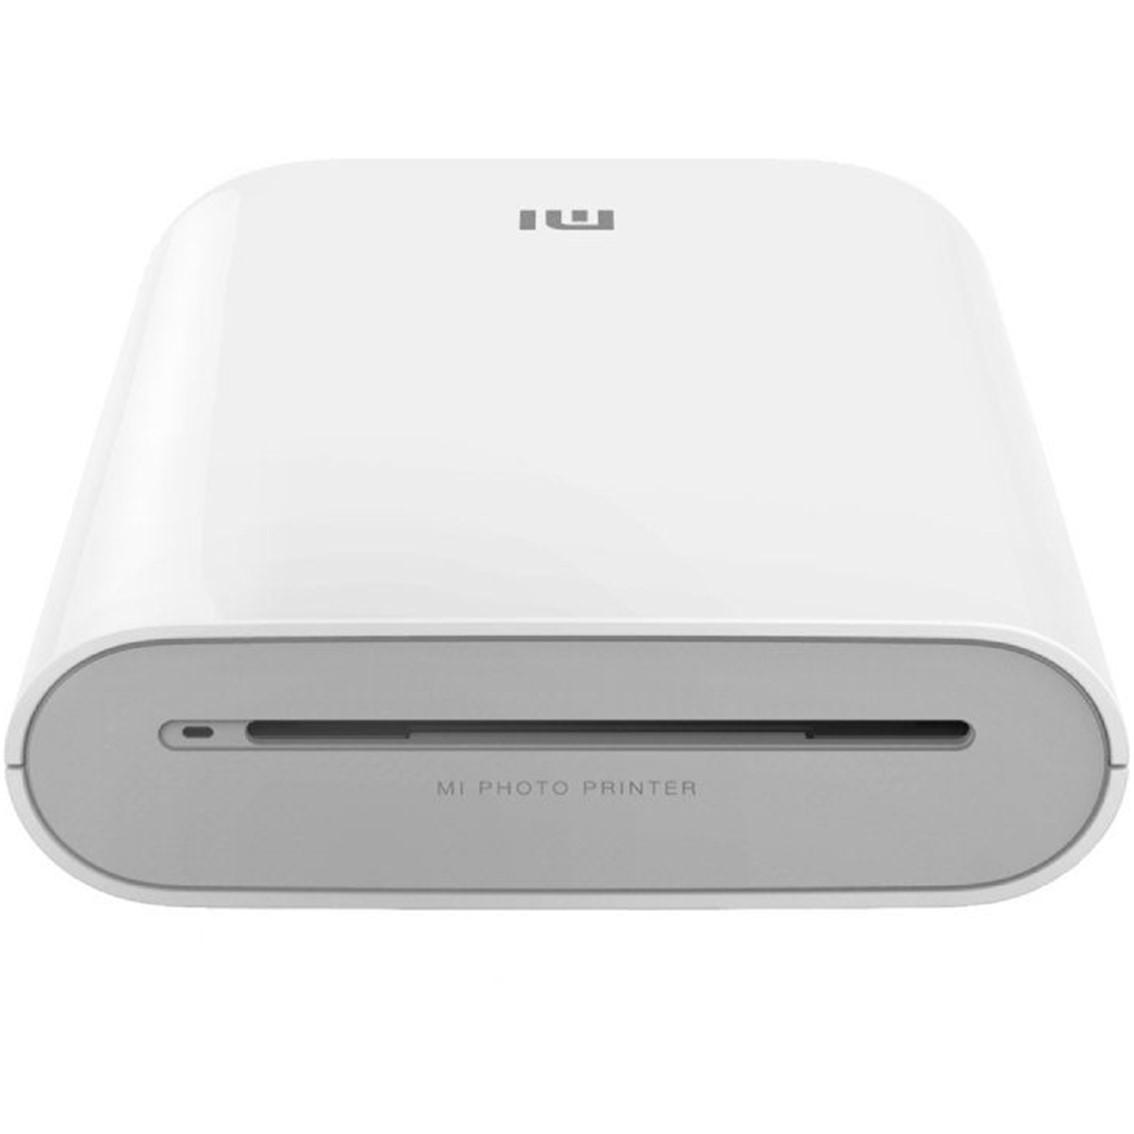 Impresora portatil fotografica xiaomi mi portable photo printer bluetooth blanca